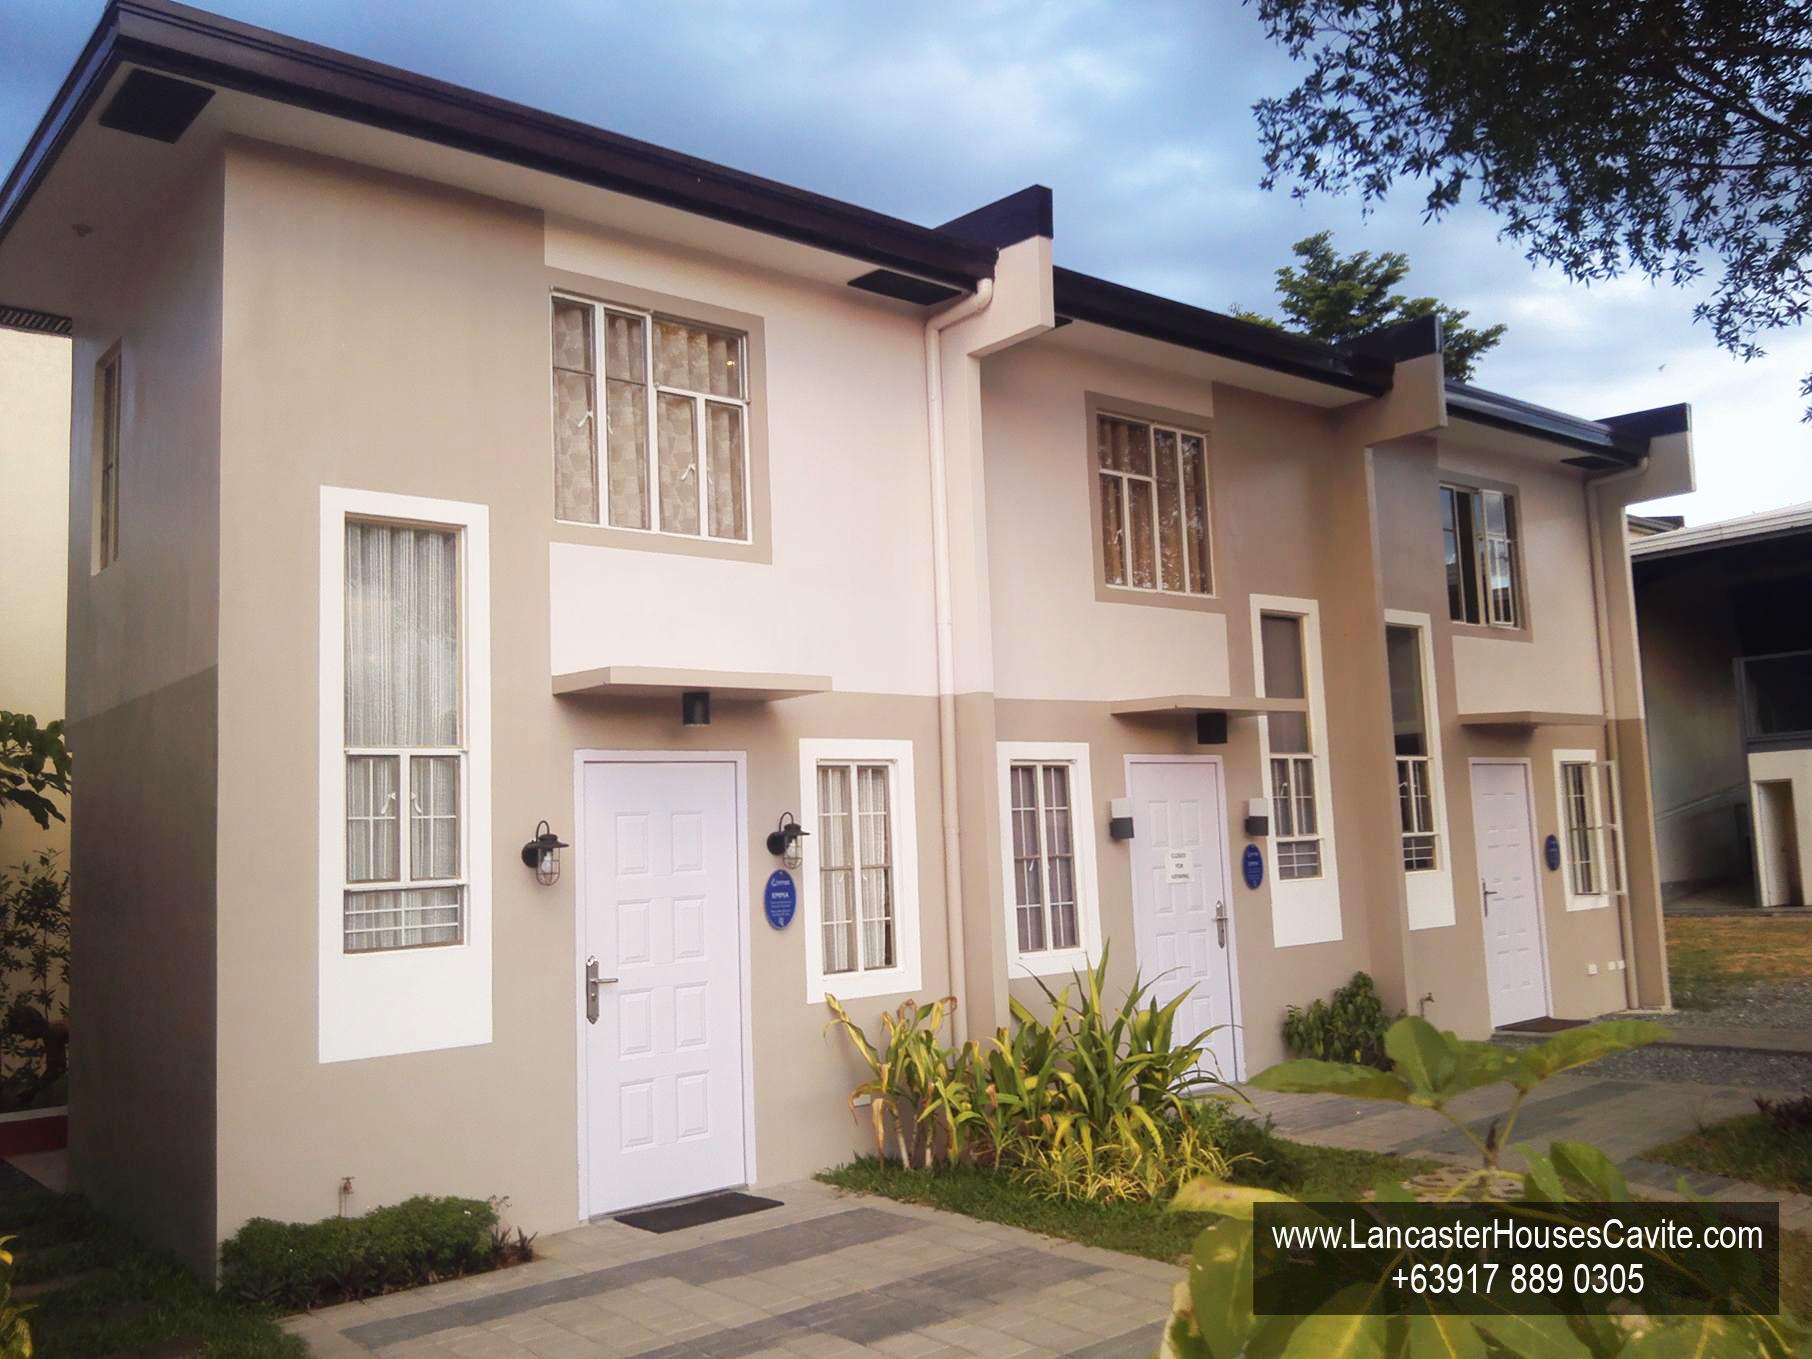 Emma House Model Lancaster Houses For Sale In Cavite